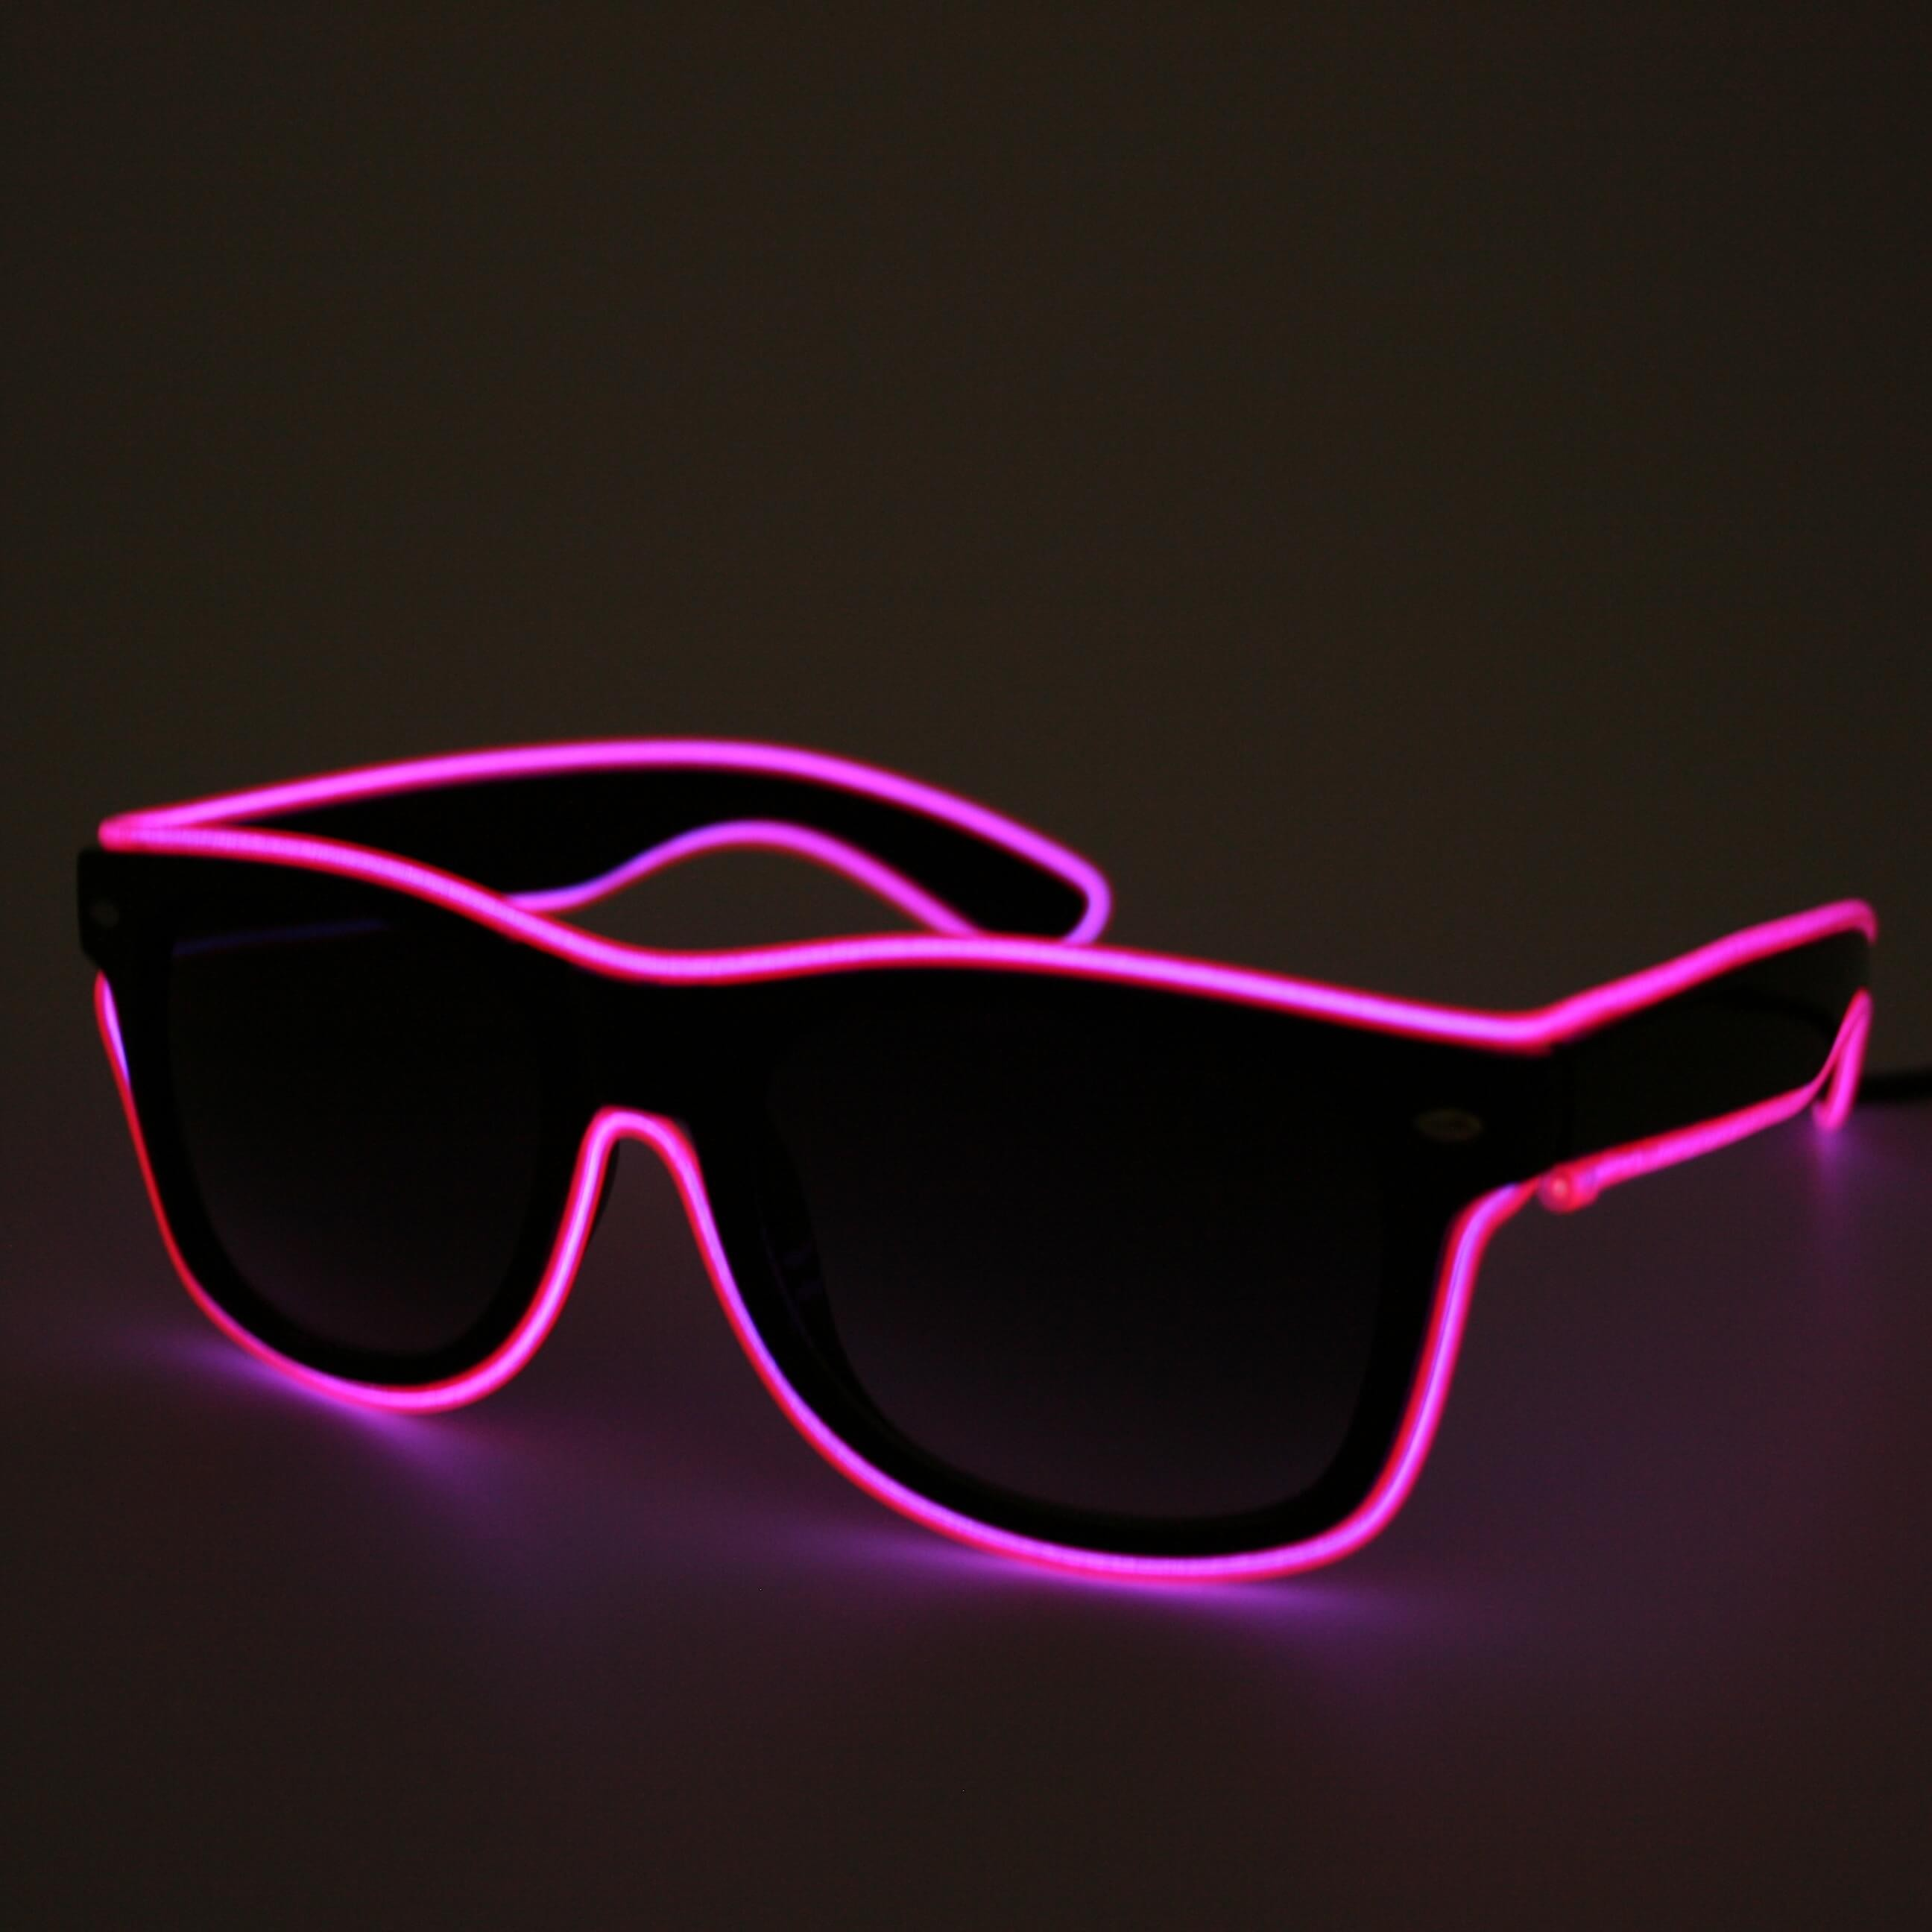 LED neon glasses pink